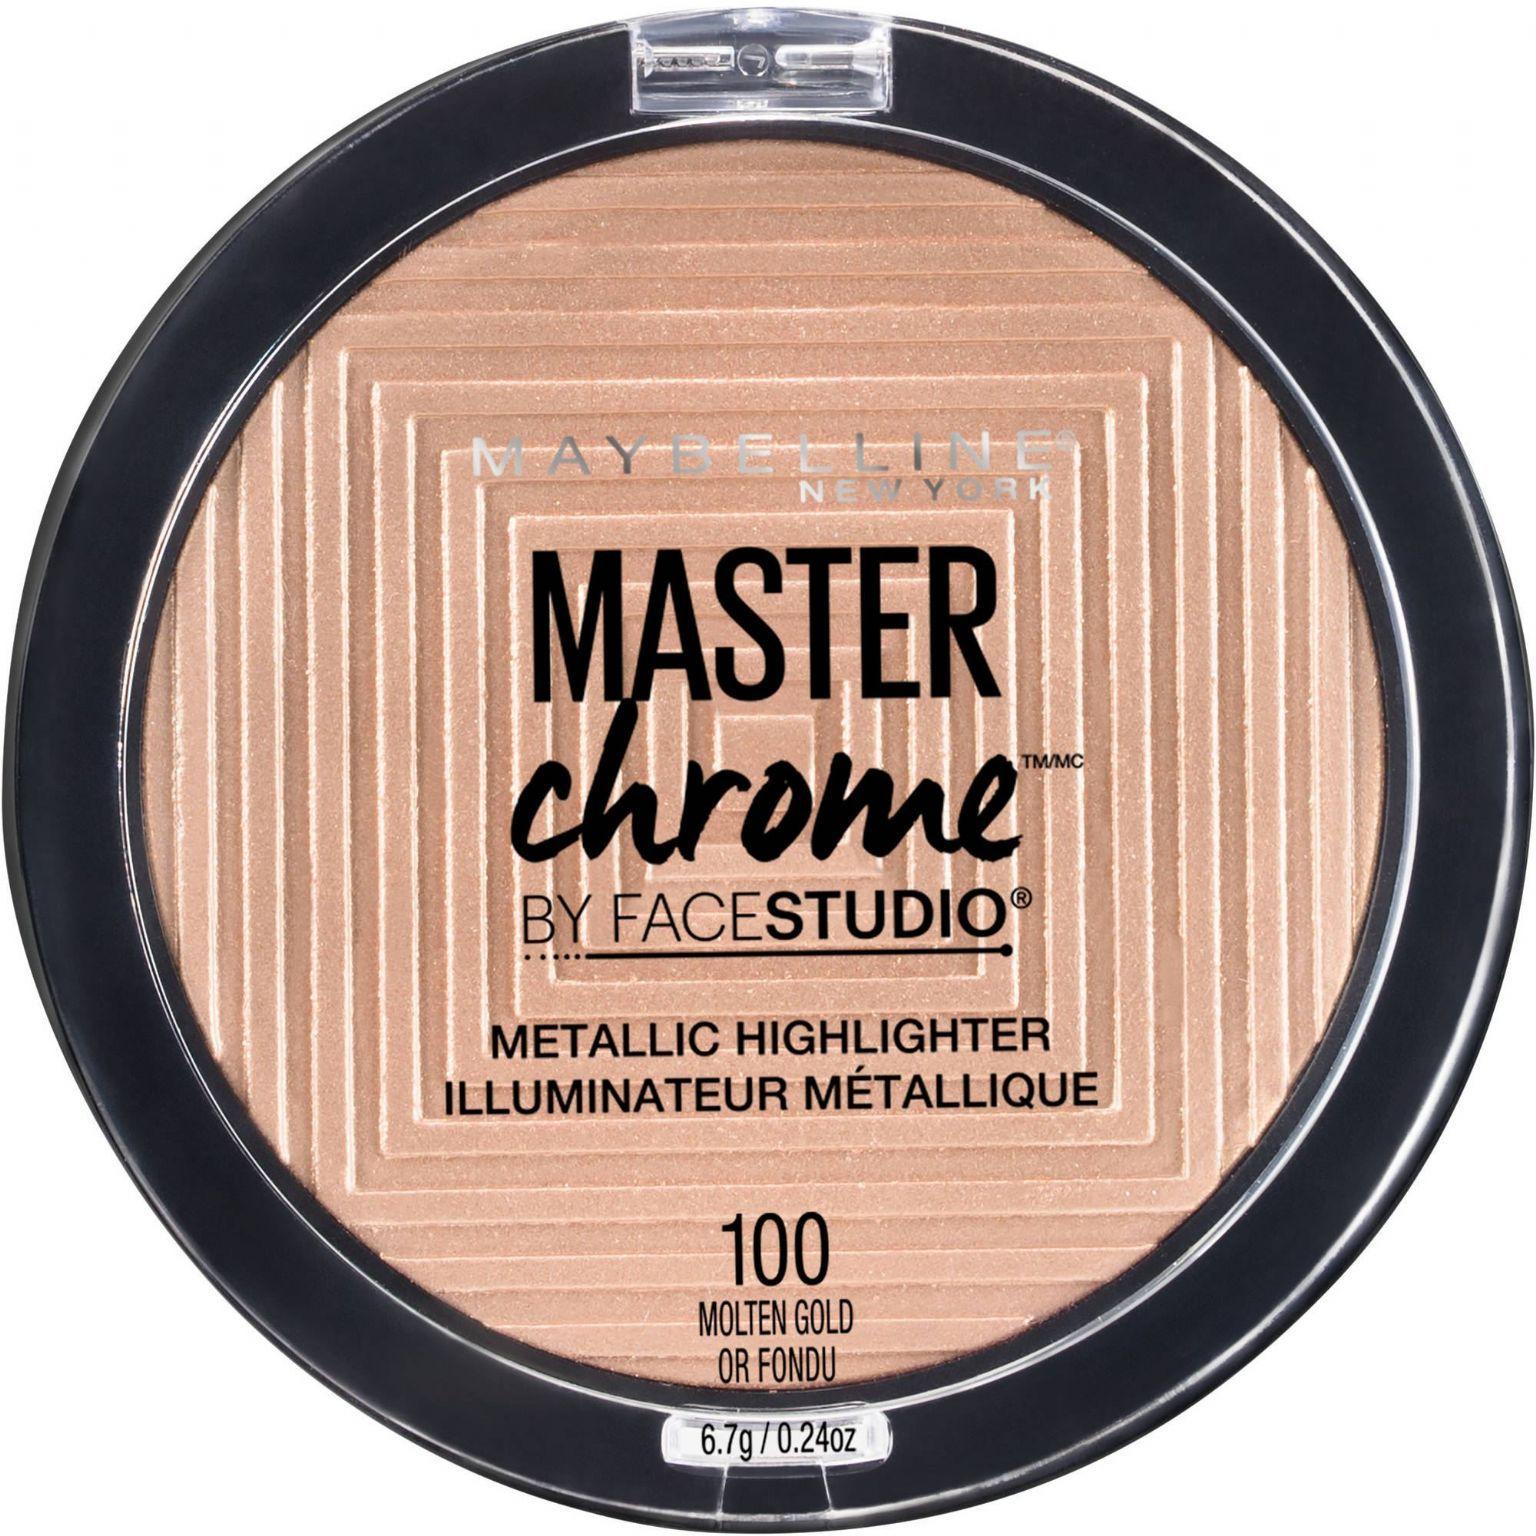 Master Chrome Metallic Highlighter - Molten Gold